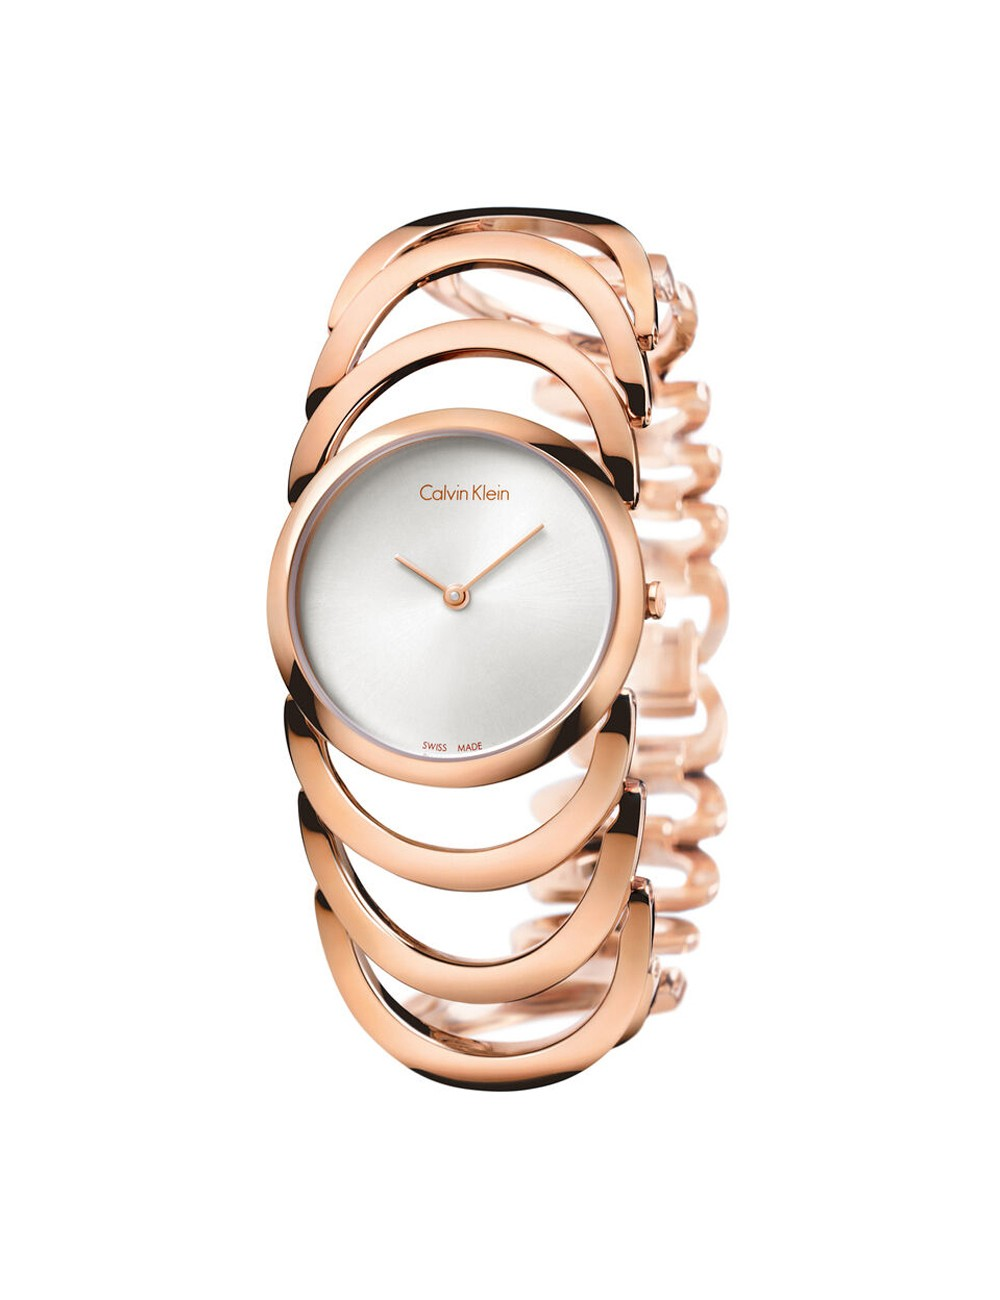 Dámske hodinky Calvin Klein Body K4G23626